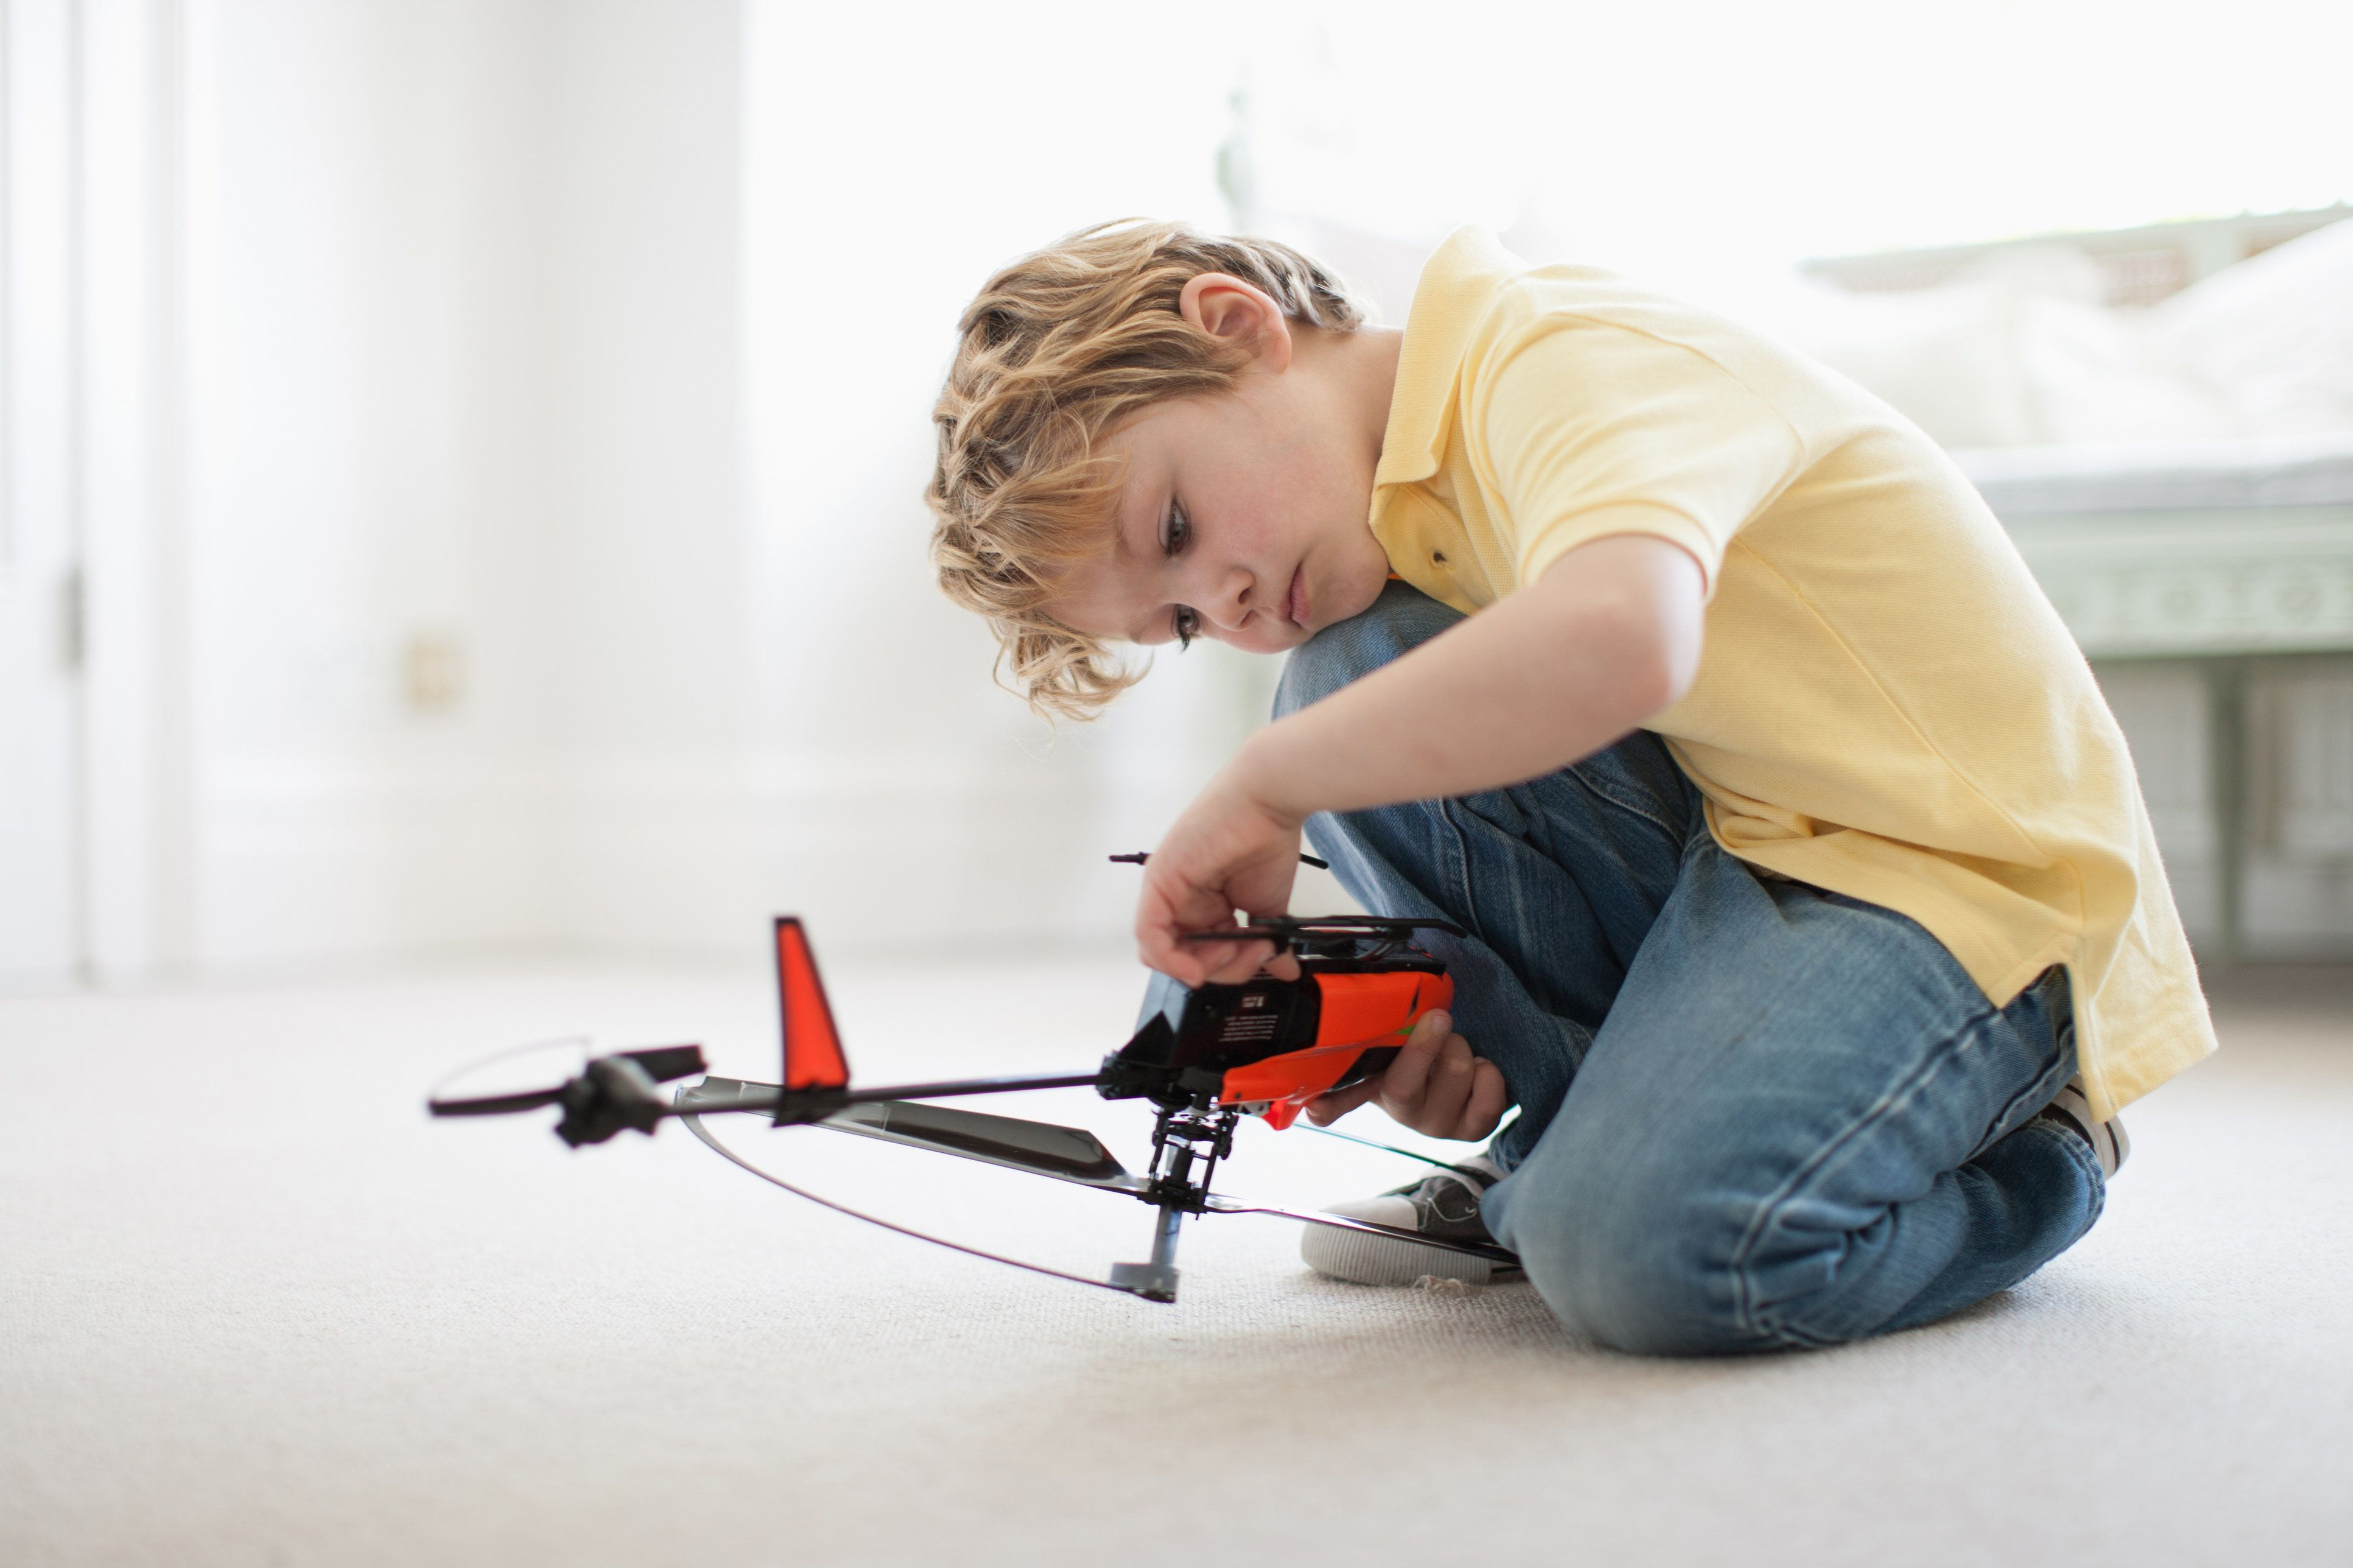 Hundreds Of Children Left Home Alone During Summer Holidays, NSPCC